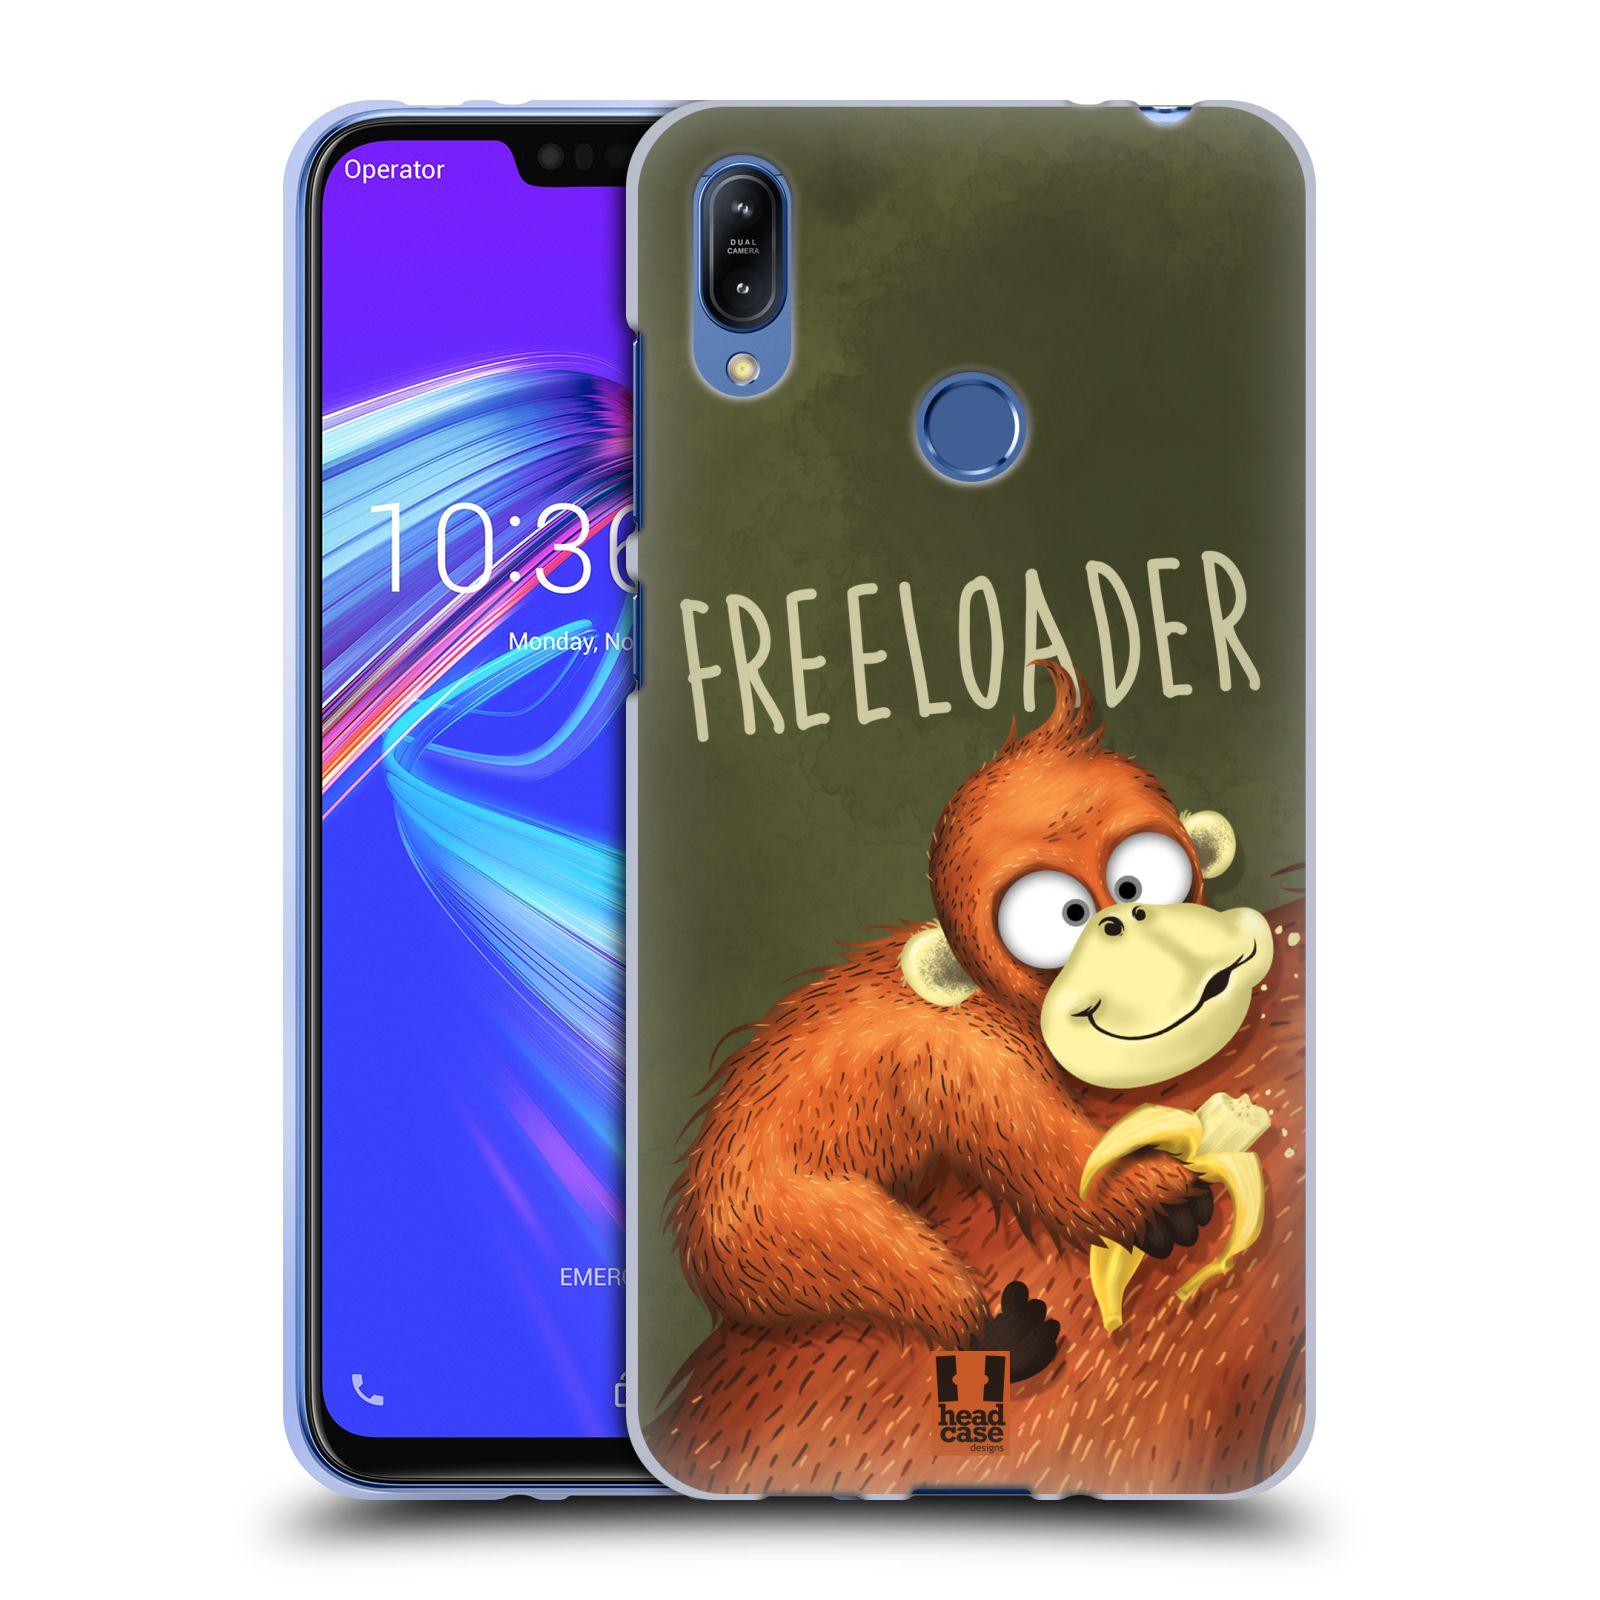 Silikonové pouzdro na mobil Asus Zenfone Max (M2) ZB633KL - Head Case - Opičák Freeloader